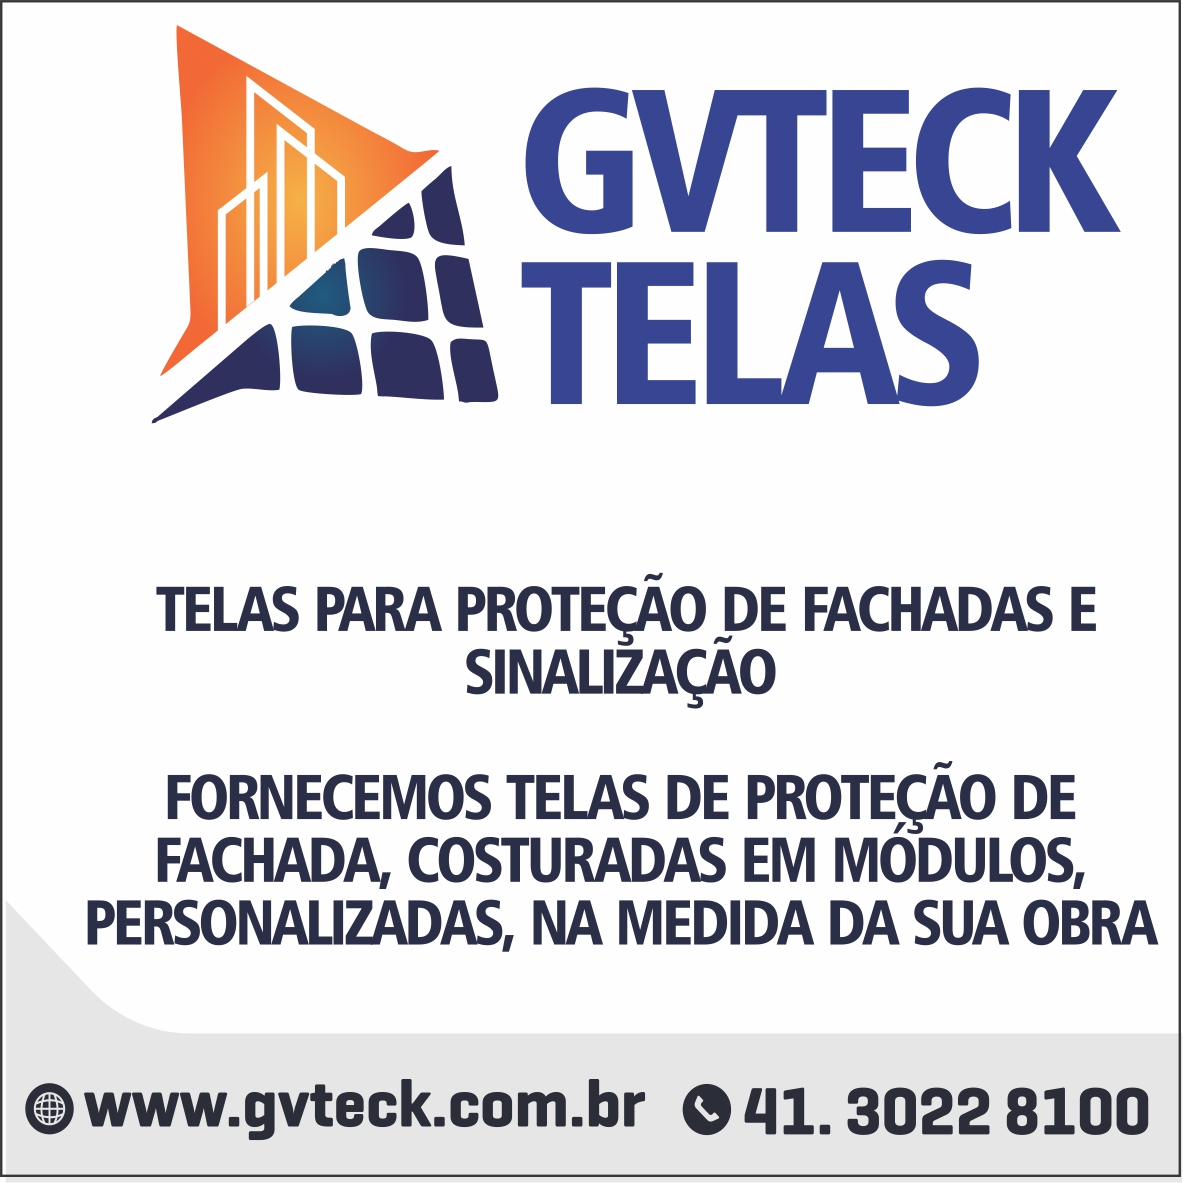 gvteck